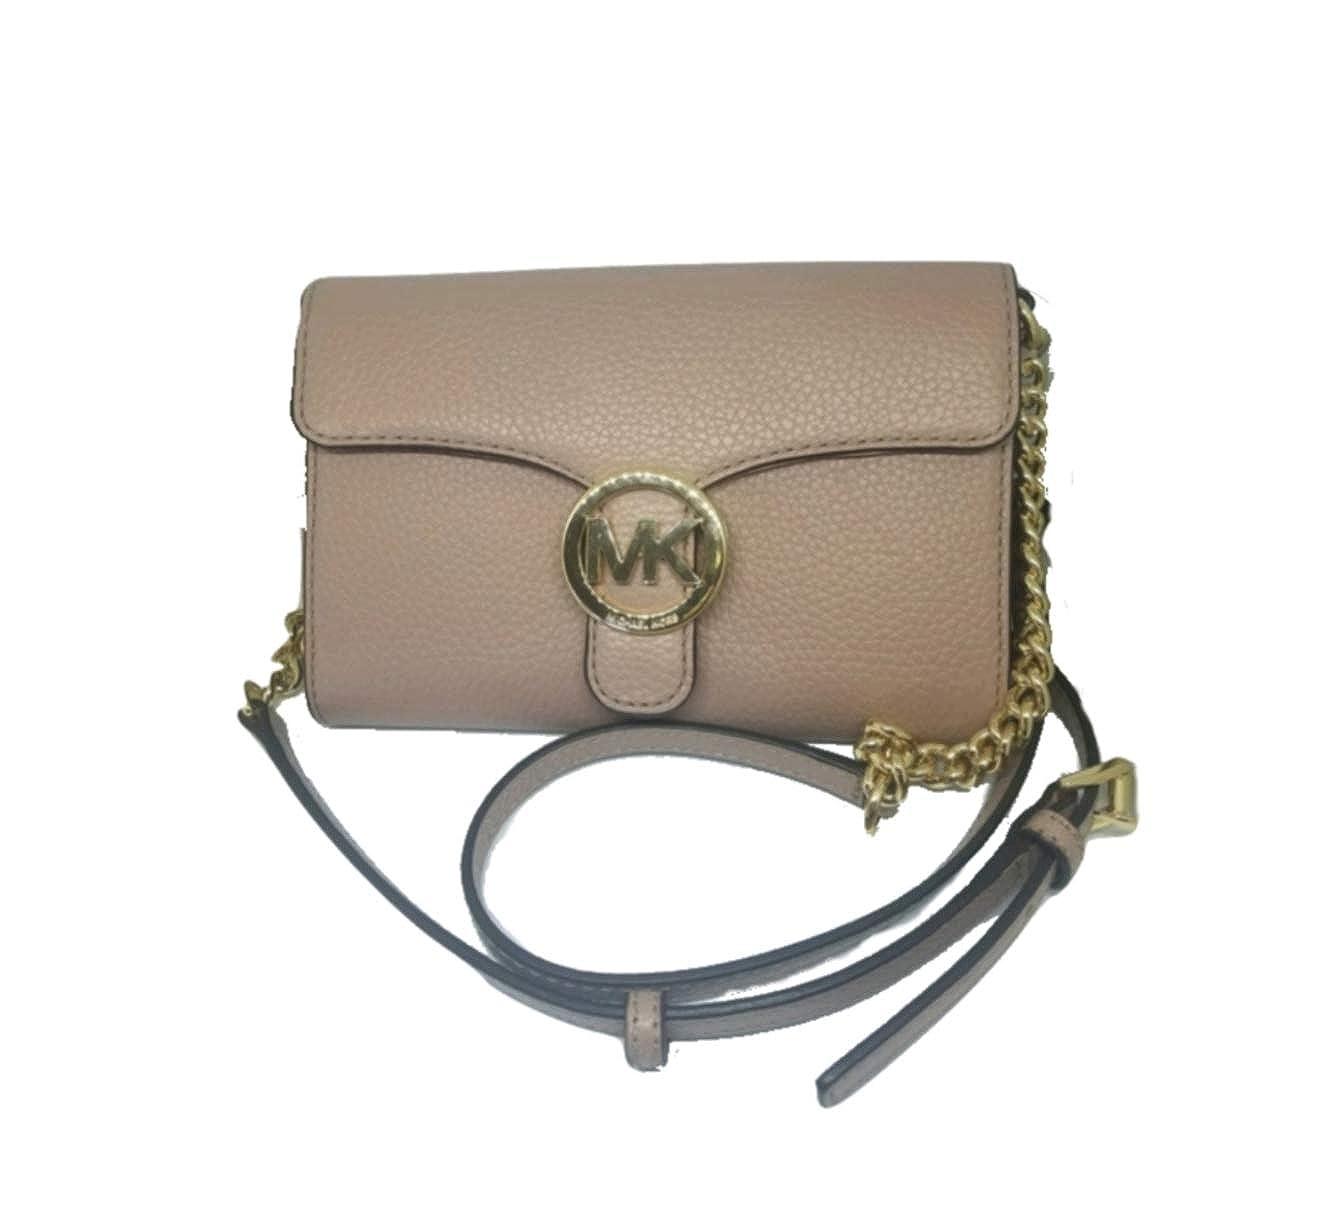 e6ac2d96b98b Michael Kors Vanna Large Leather Phone Crossbody Bag, Fawn: Handbags:  Amazon.com